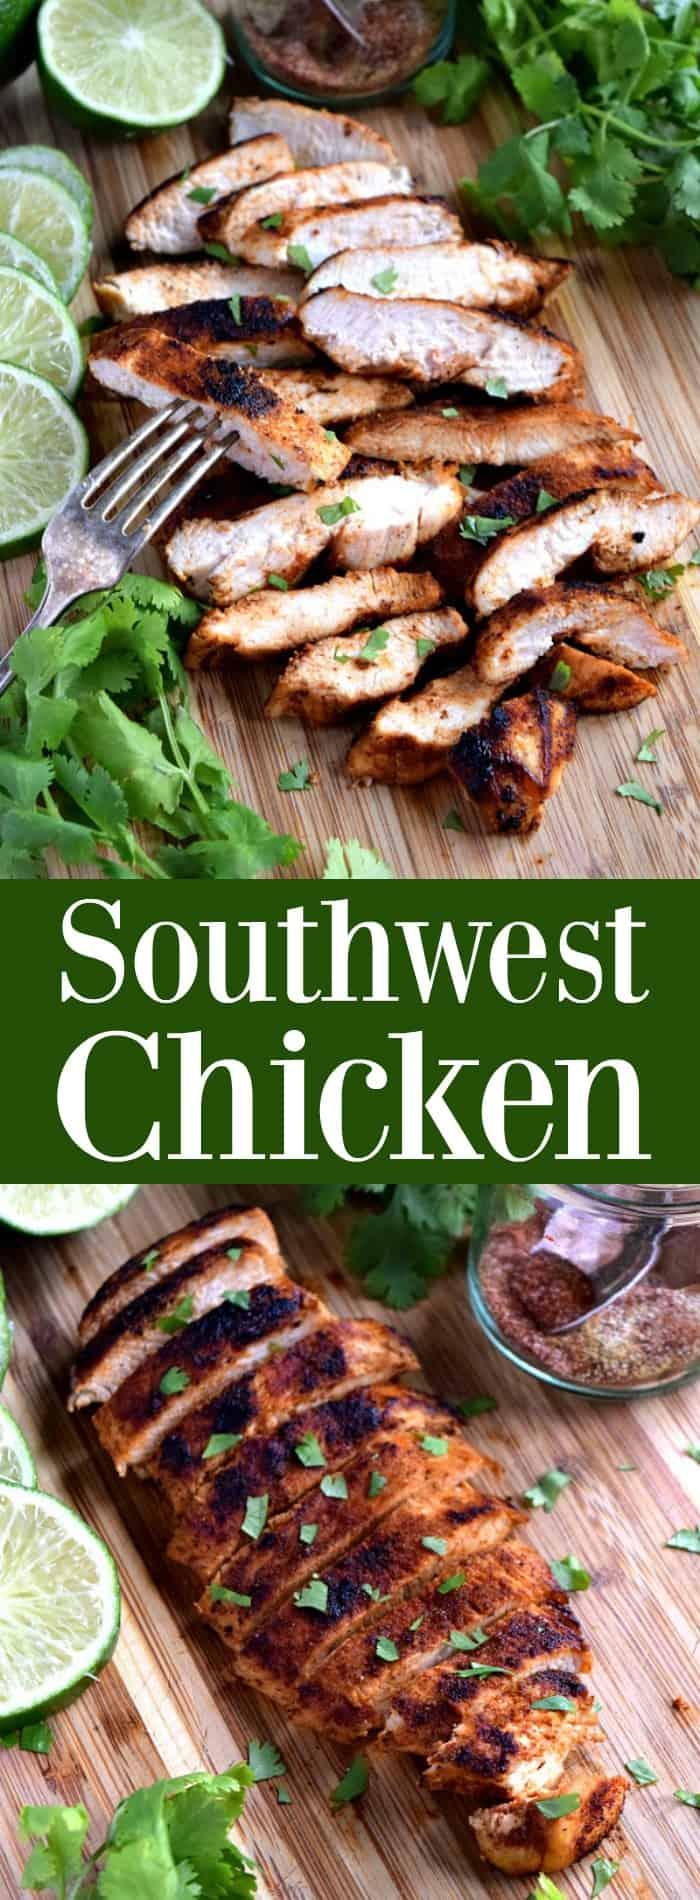 Southwest Chicken - flavorful chicken made easy with a simple dry rub #chicken #dinnerideas #southwest #southwestchicken